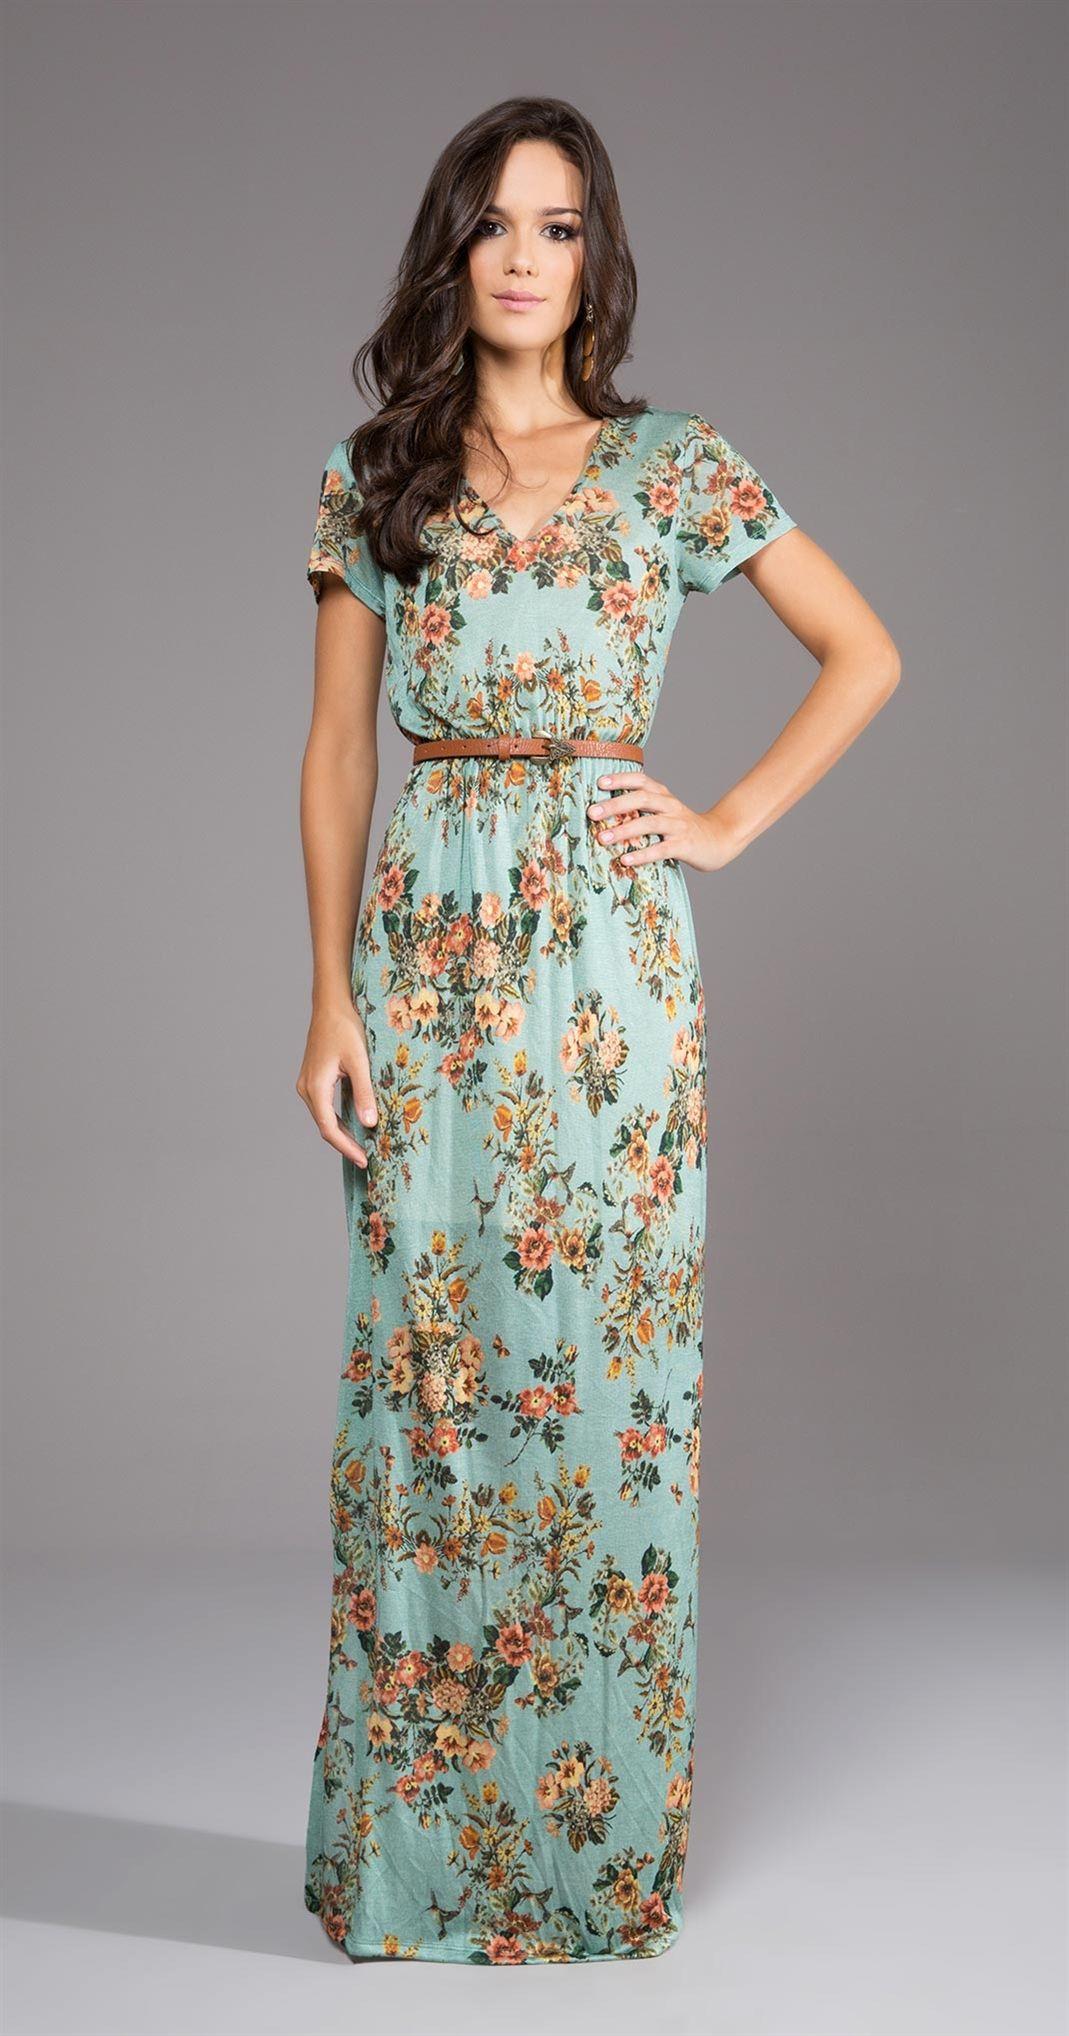 Vestido longo tricot floral fashion design pinterest tricot